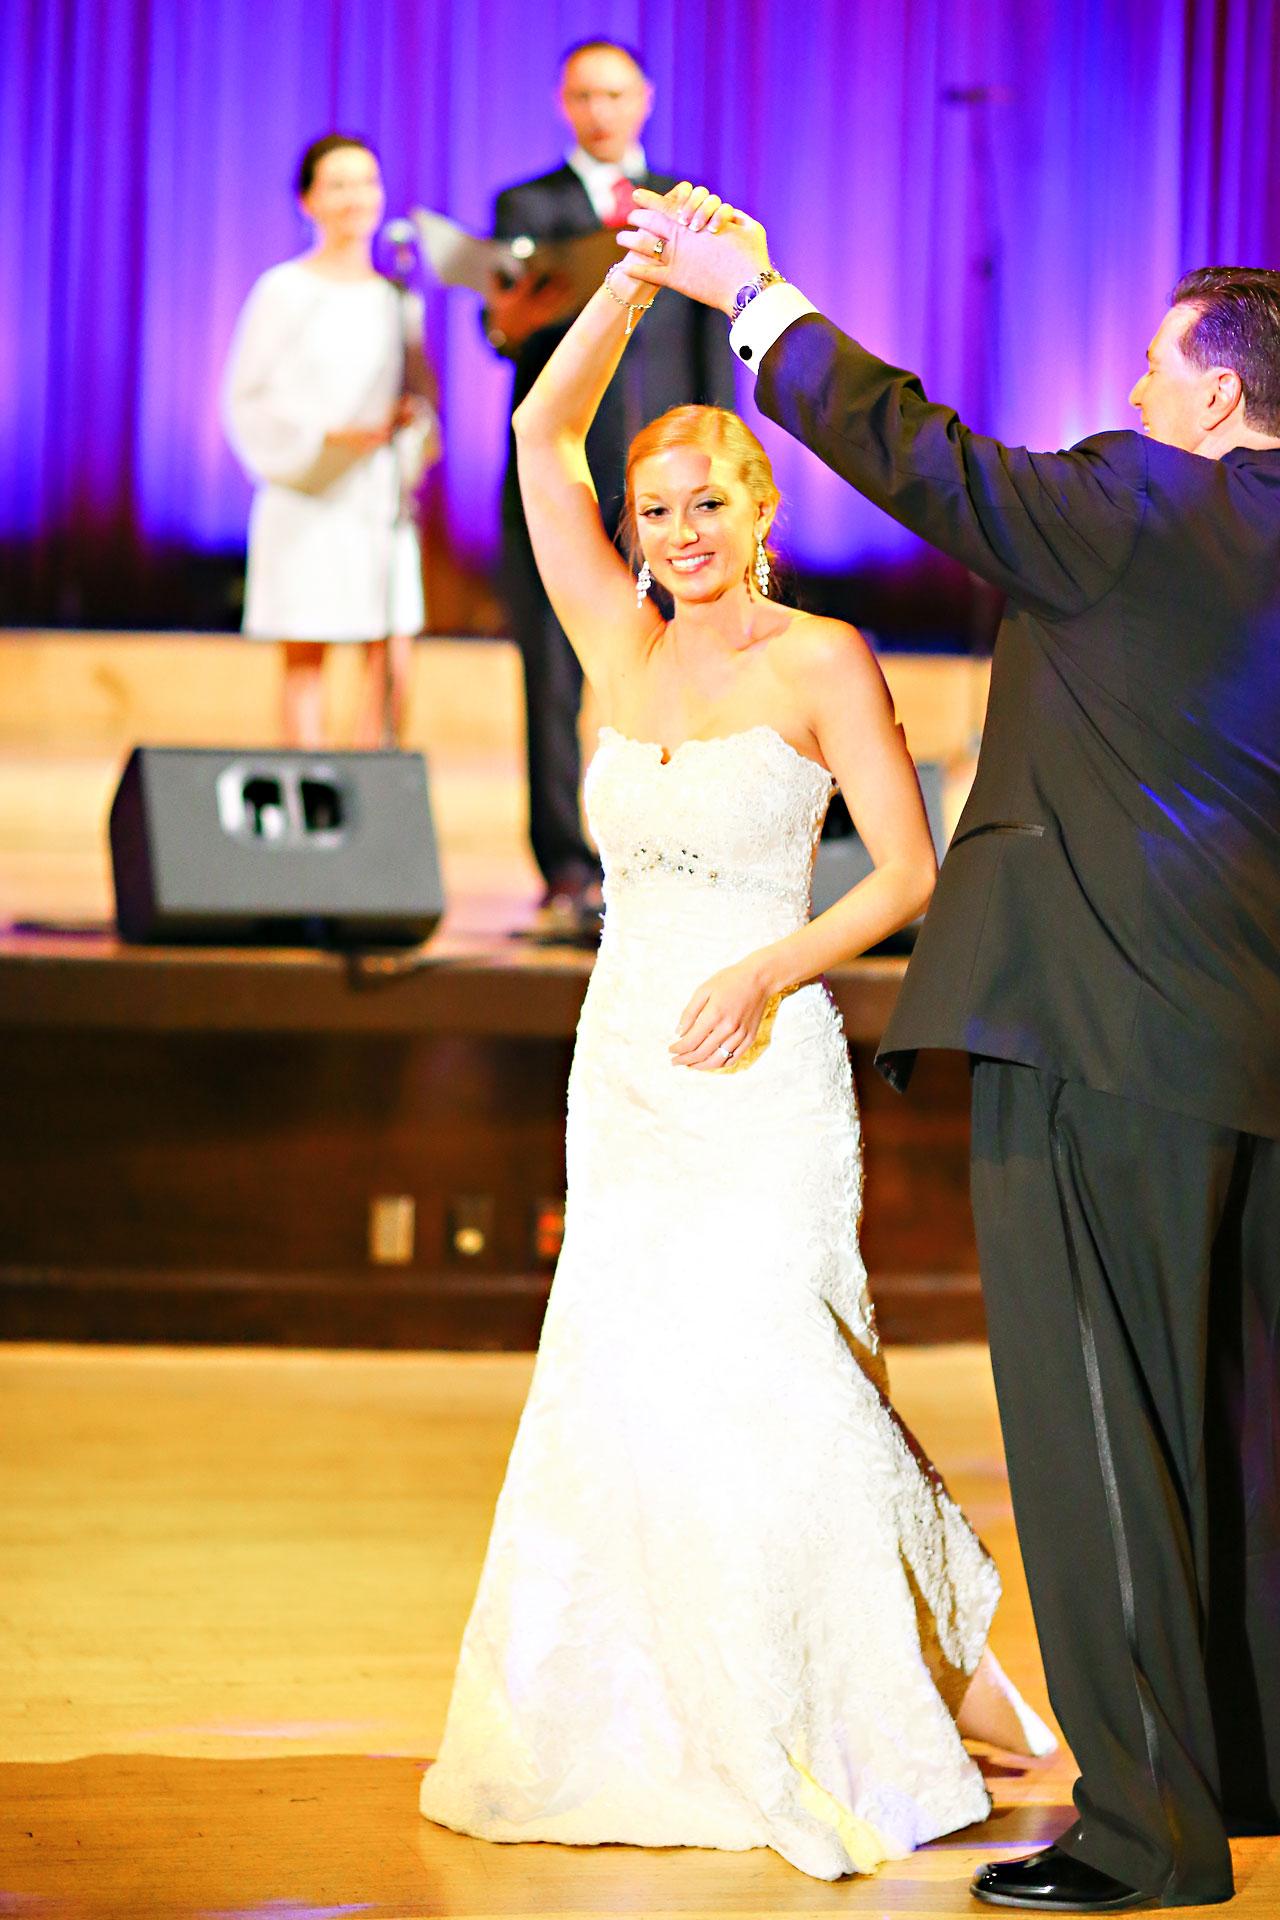 Chandra Kevin Indiana Roof Ballroom wedding 0224